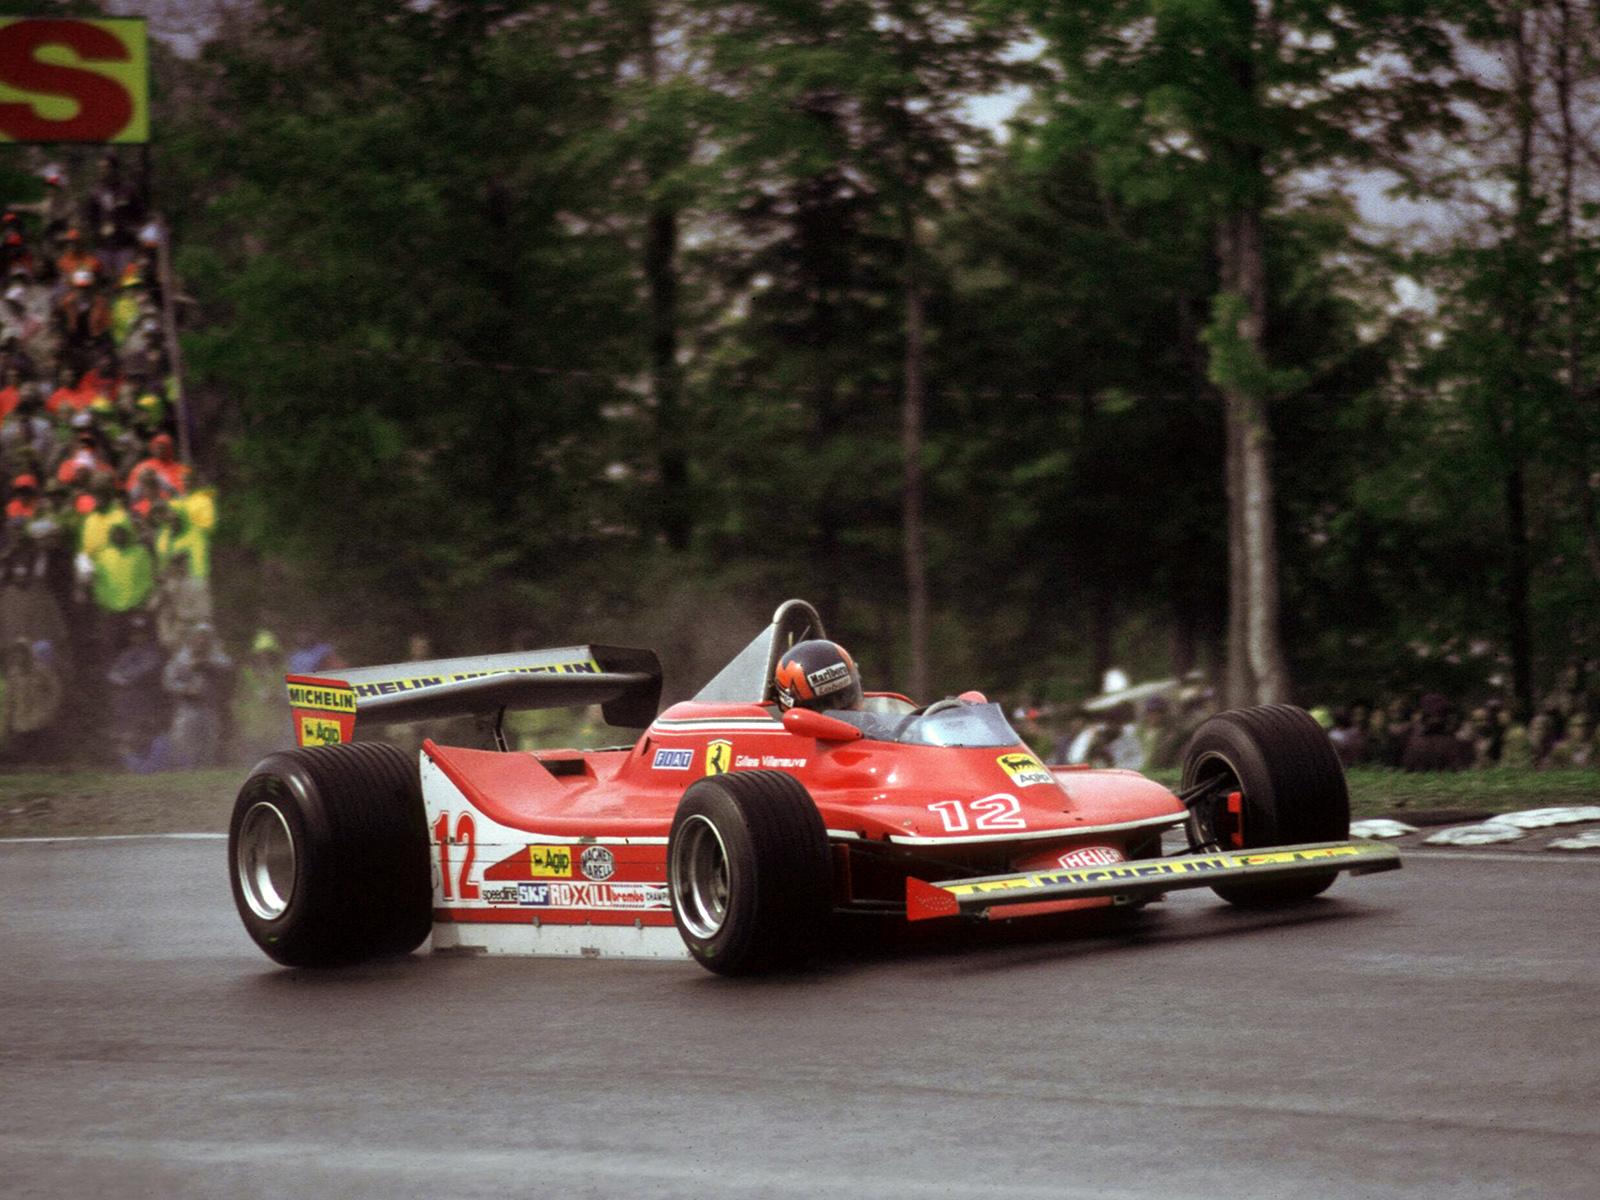 Hd Wallpapers Cars 3 1979 Ferrari 312 T4 Formula One F 1 Race Racing T 4 T